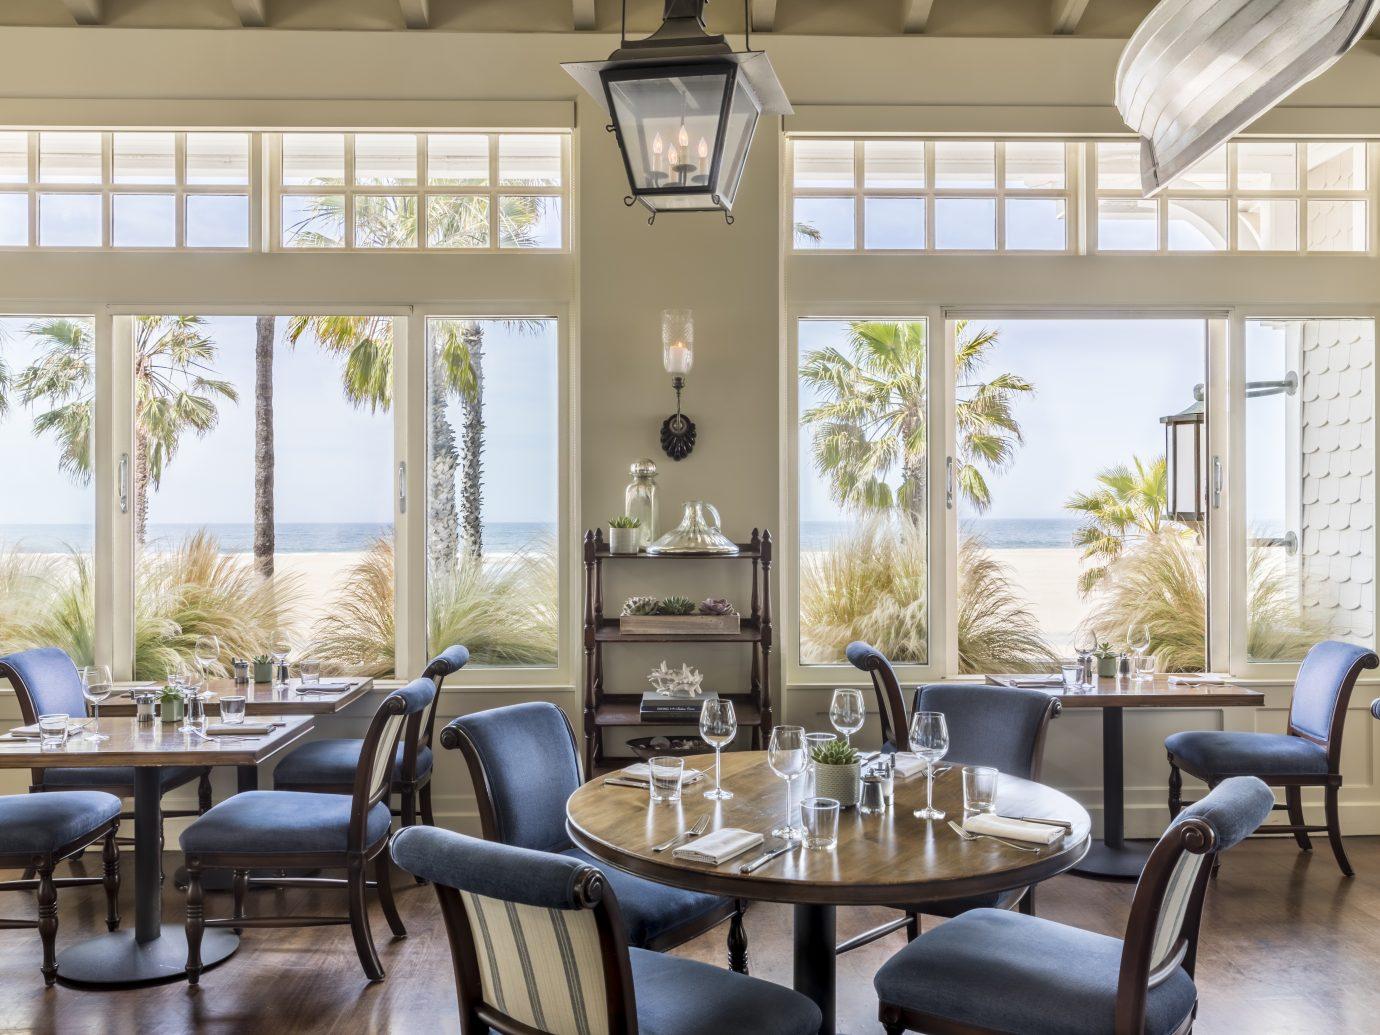 Restaurant at Shutters on the Beach, Santa Monica, CA